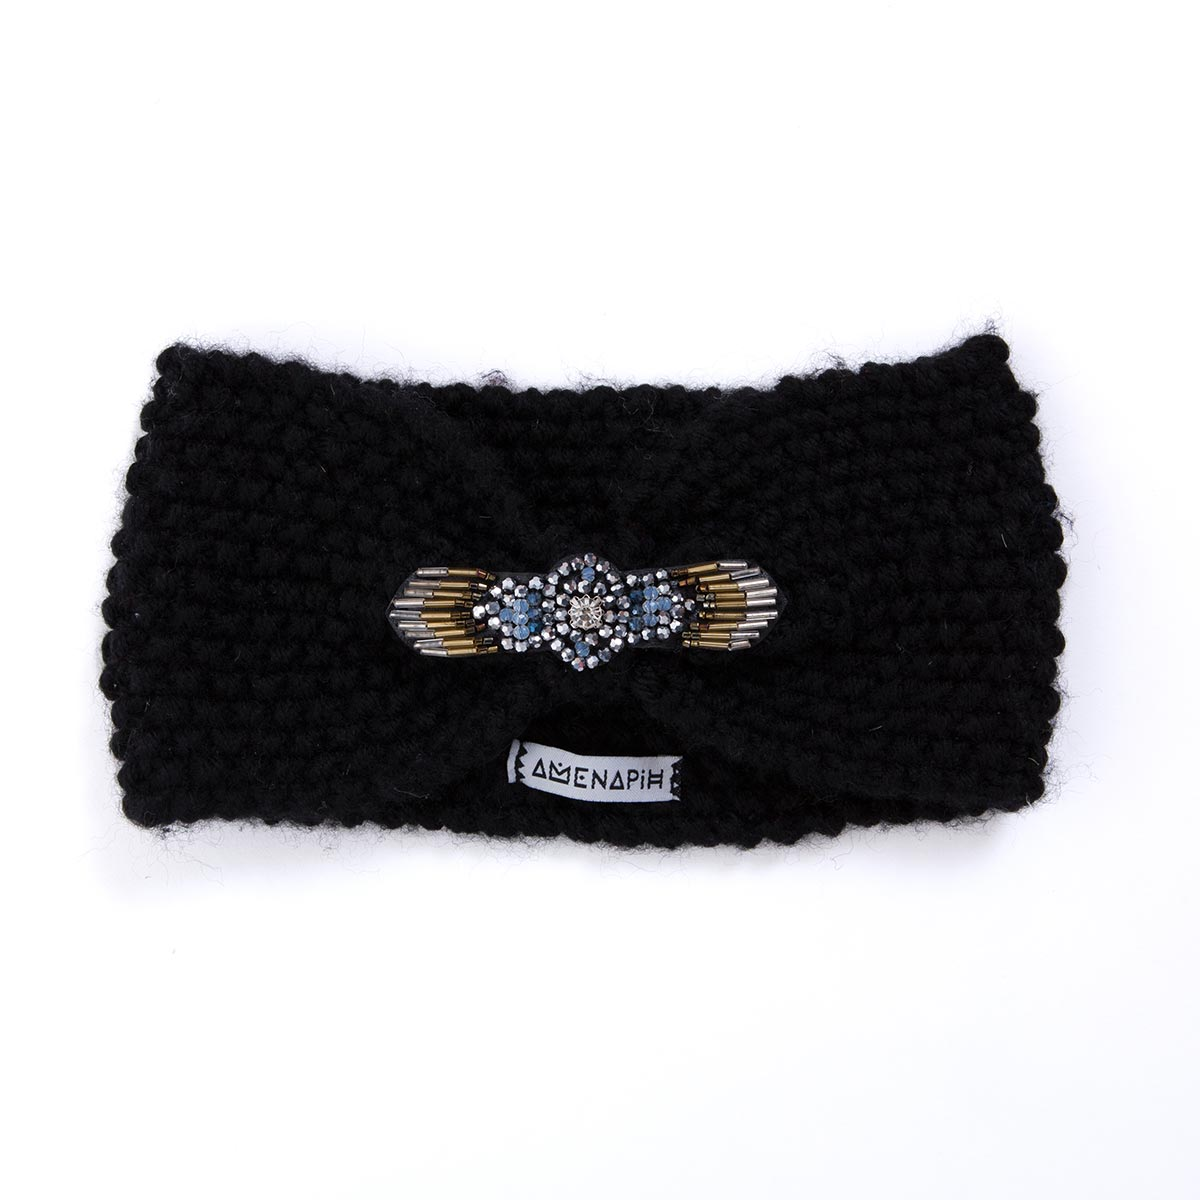 headband foxy noir amenapih by hipanema accessoires chapeaux de plage headband www. Black Bedroom Furniture Sets. Home Design Ideas